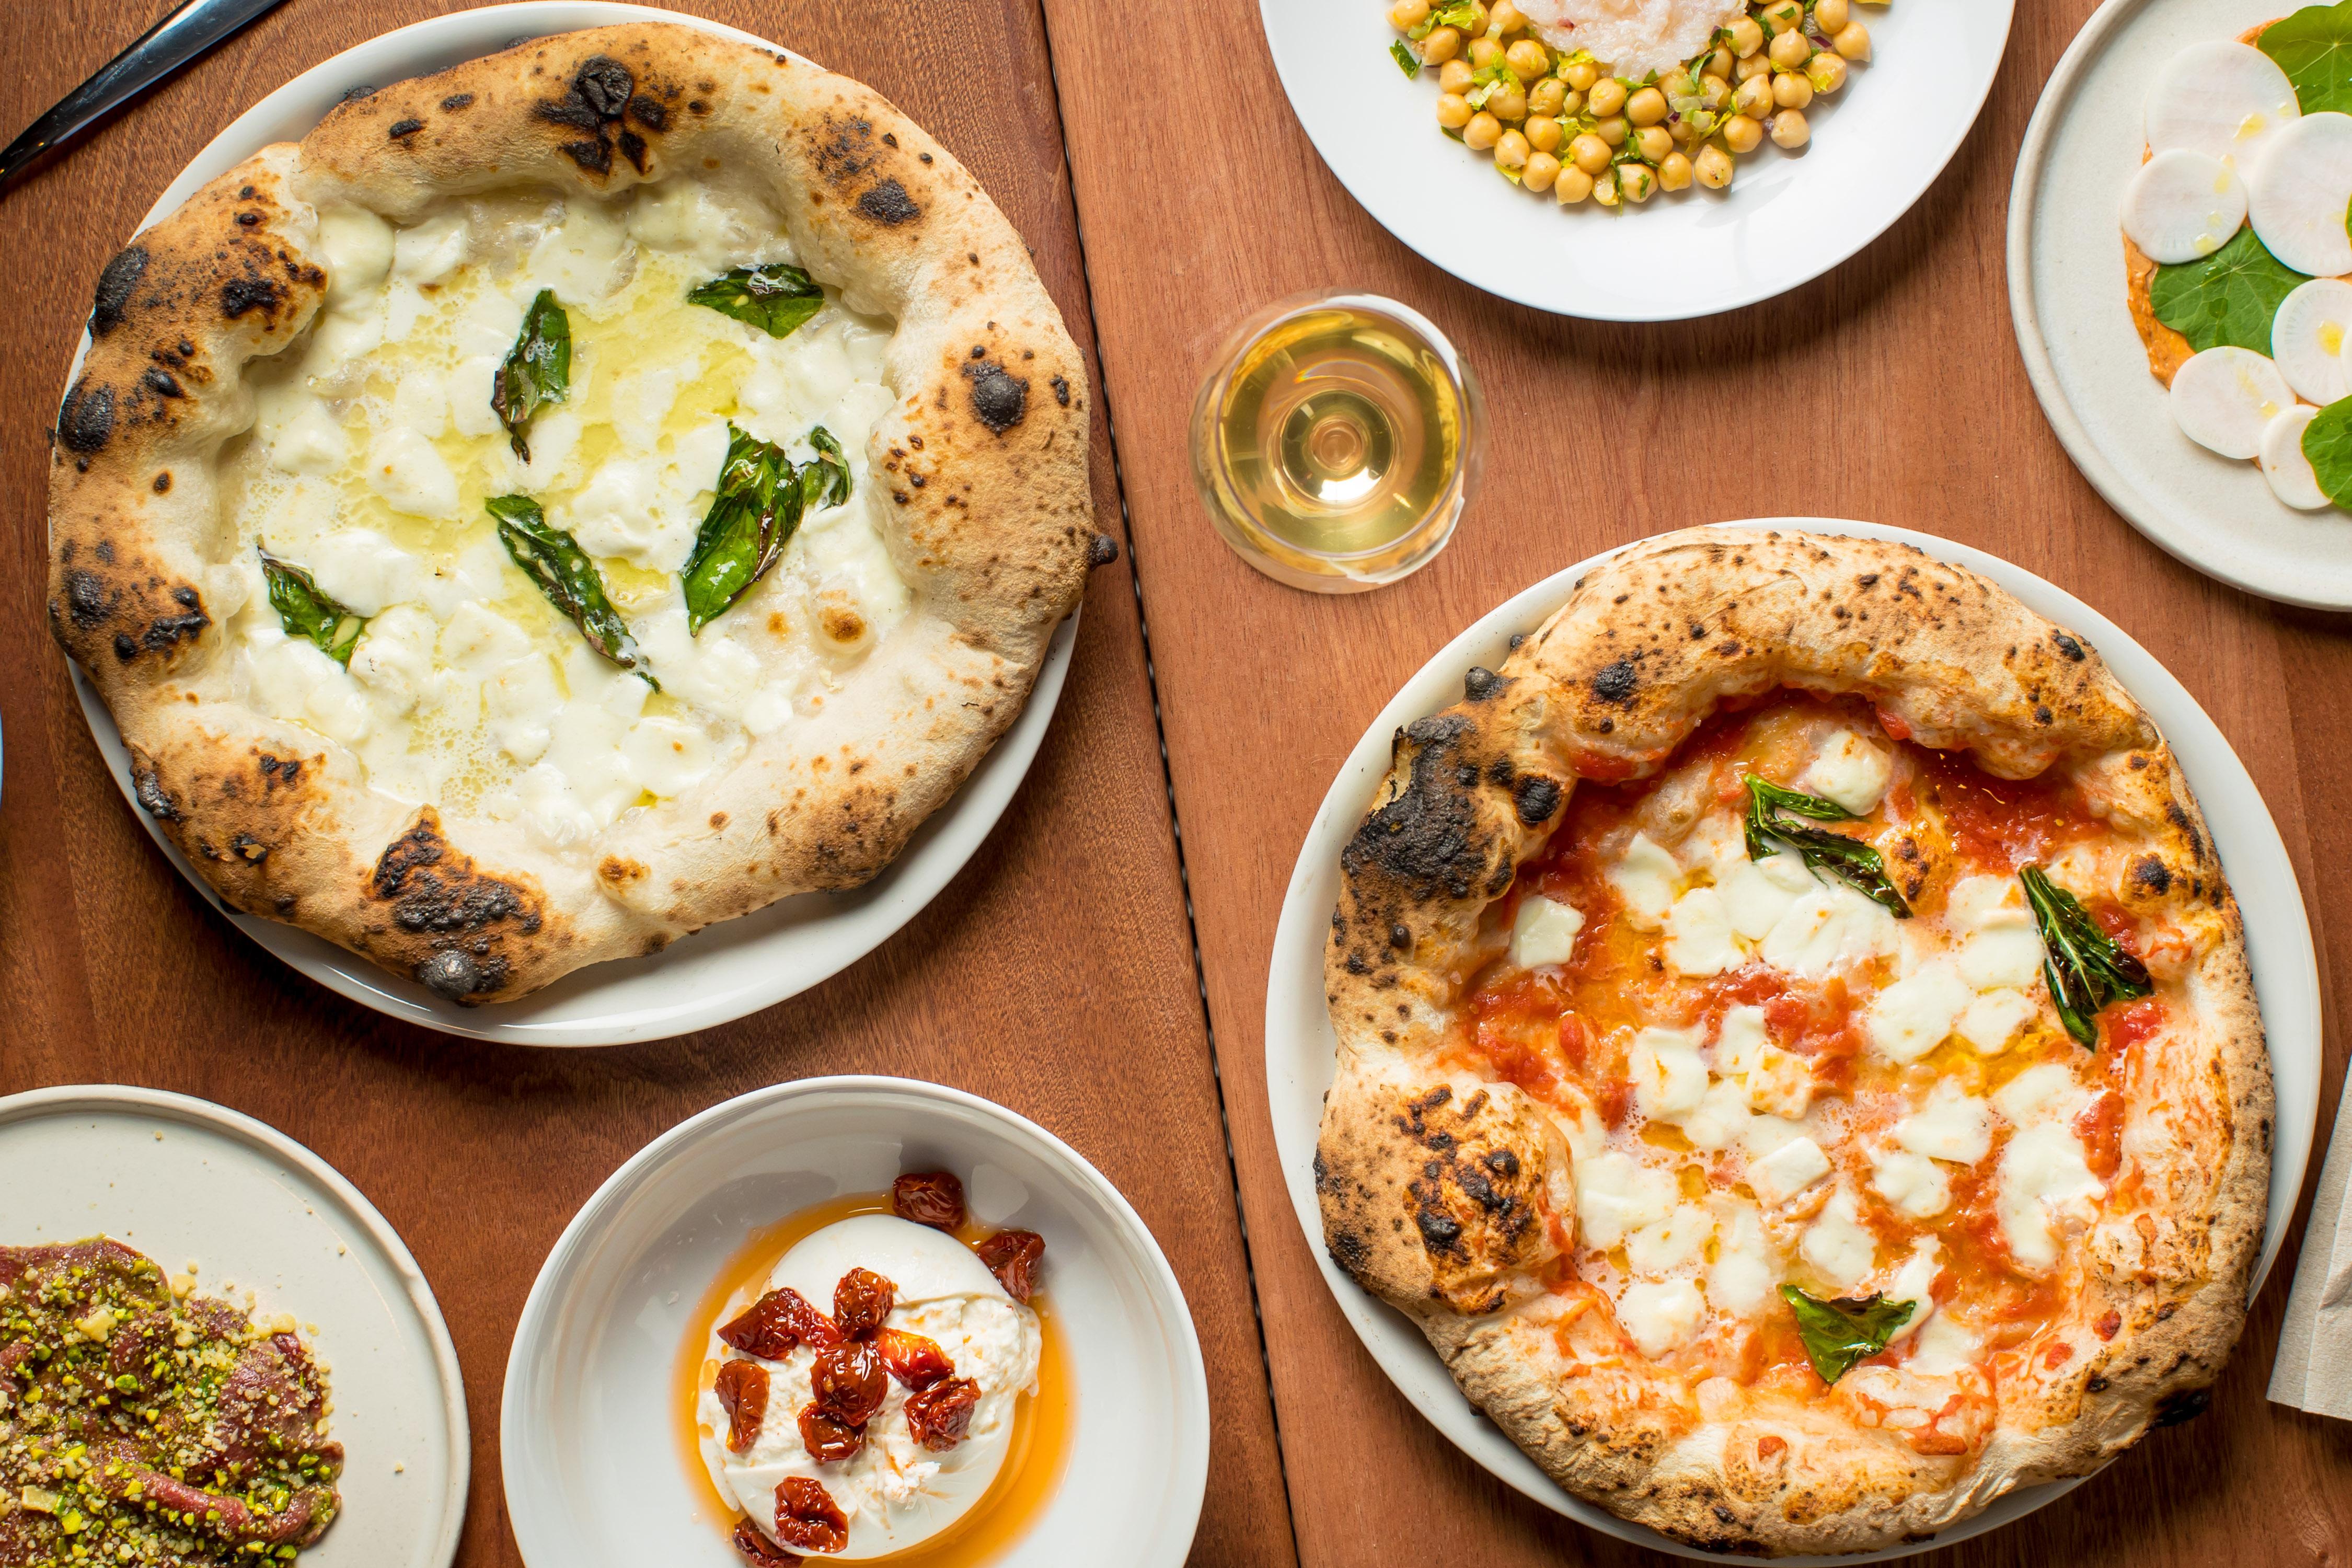 Pizzas and small plates at Una Pizza Napoletana